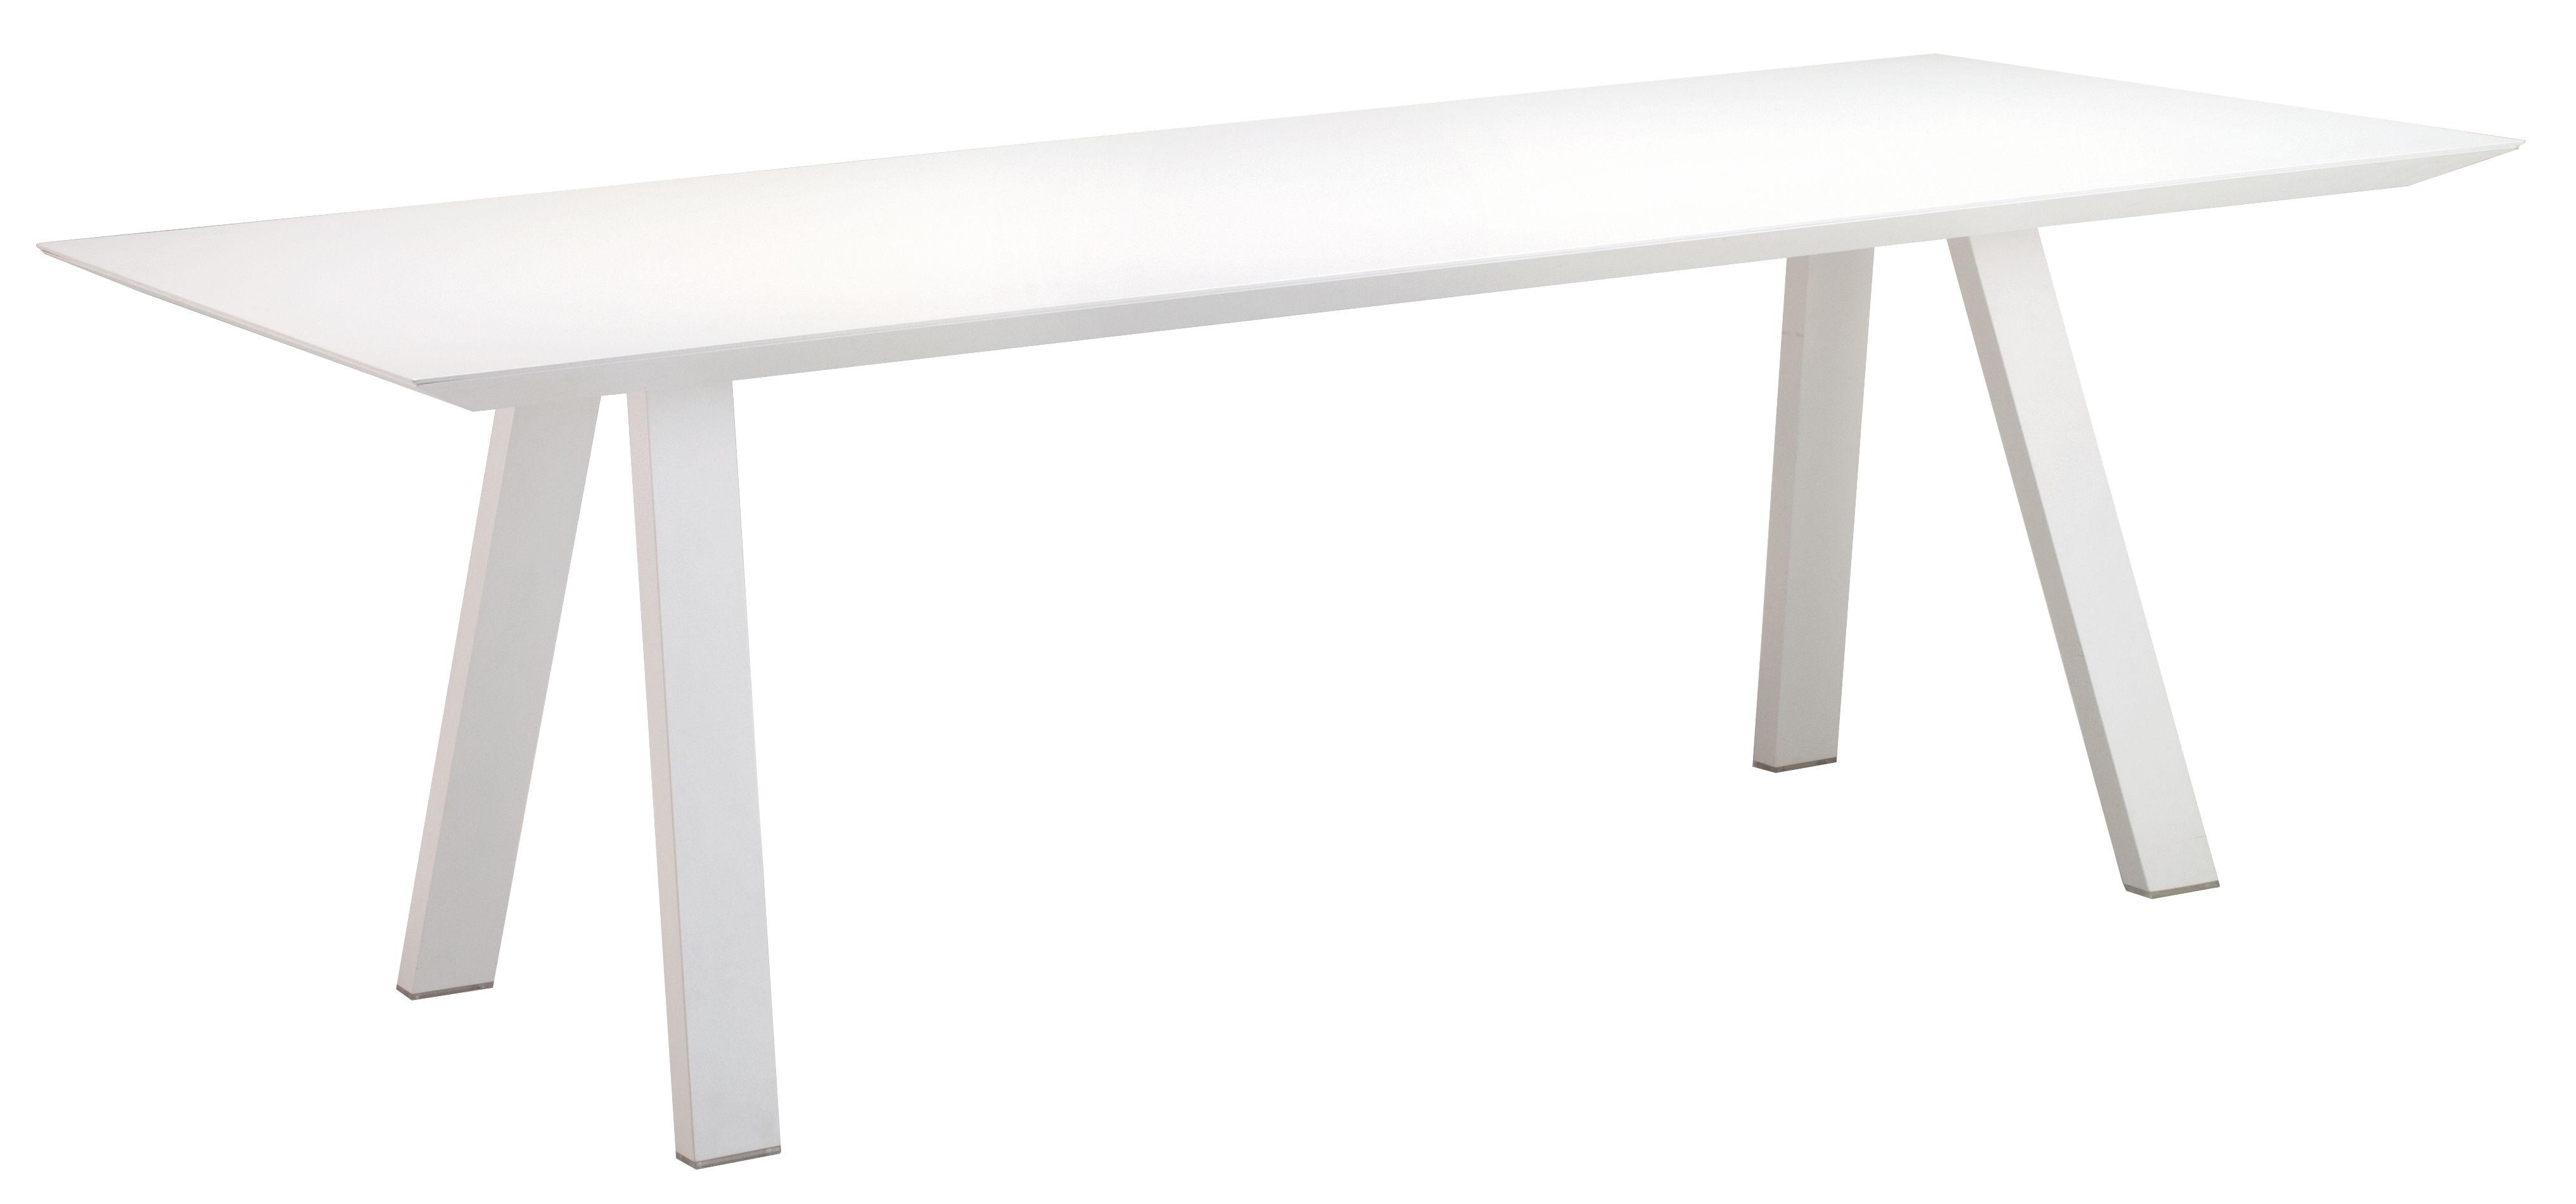 Jardin - Tables de jardin - Table Vanity / 220 x 110 cm - Aluminium - Vlaemynck - Blanc - Aluminium laqué